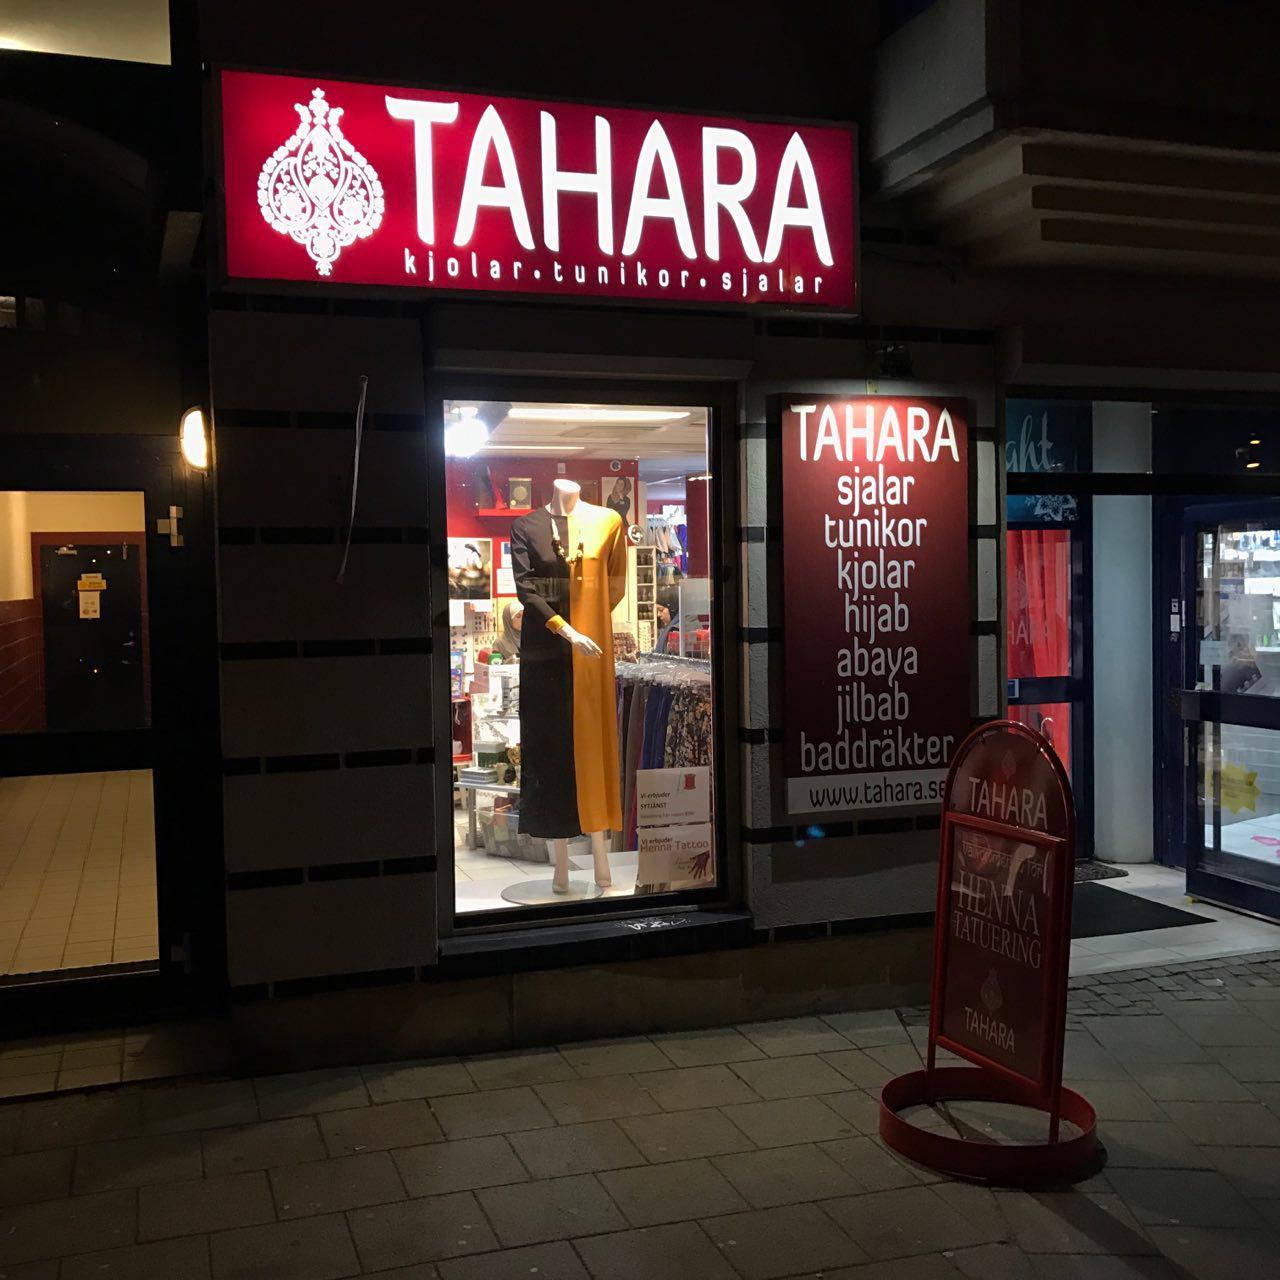 TAHARA in Sweden at night.